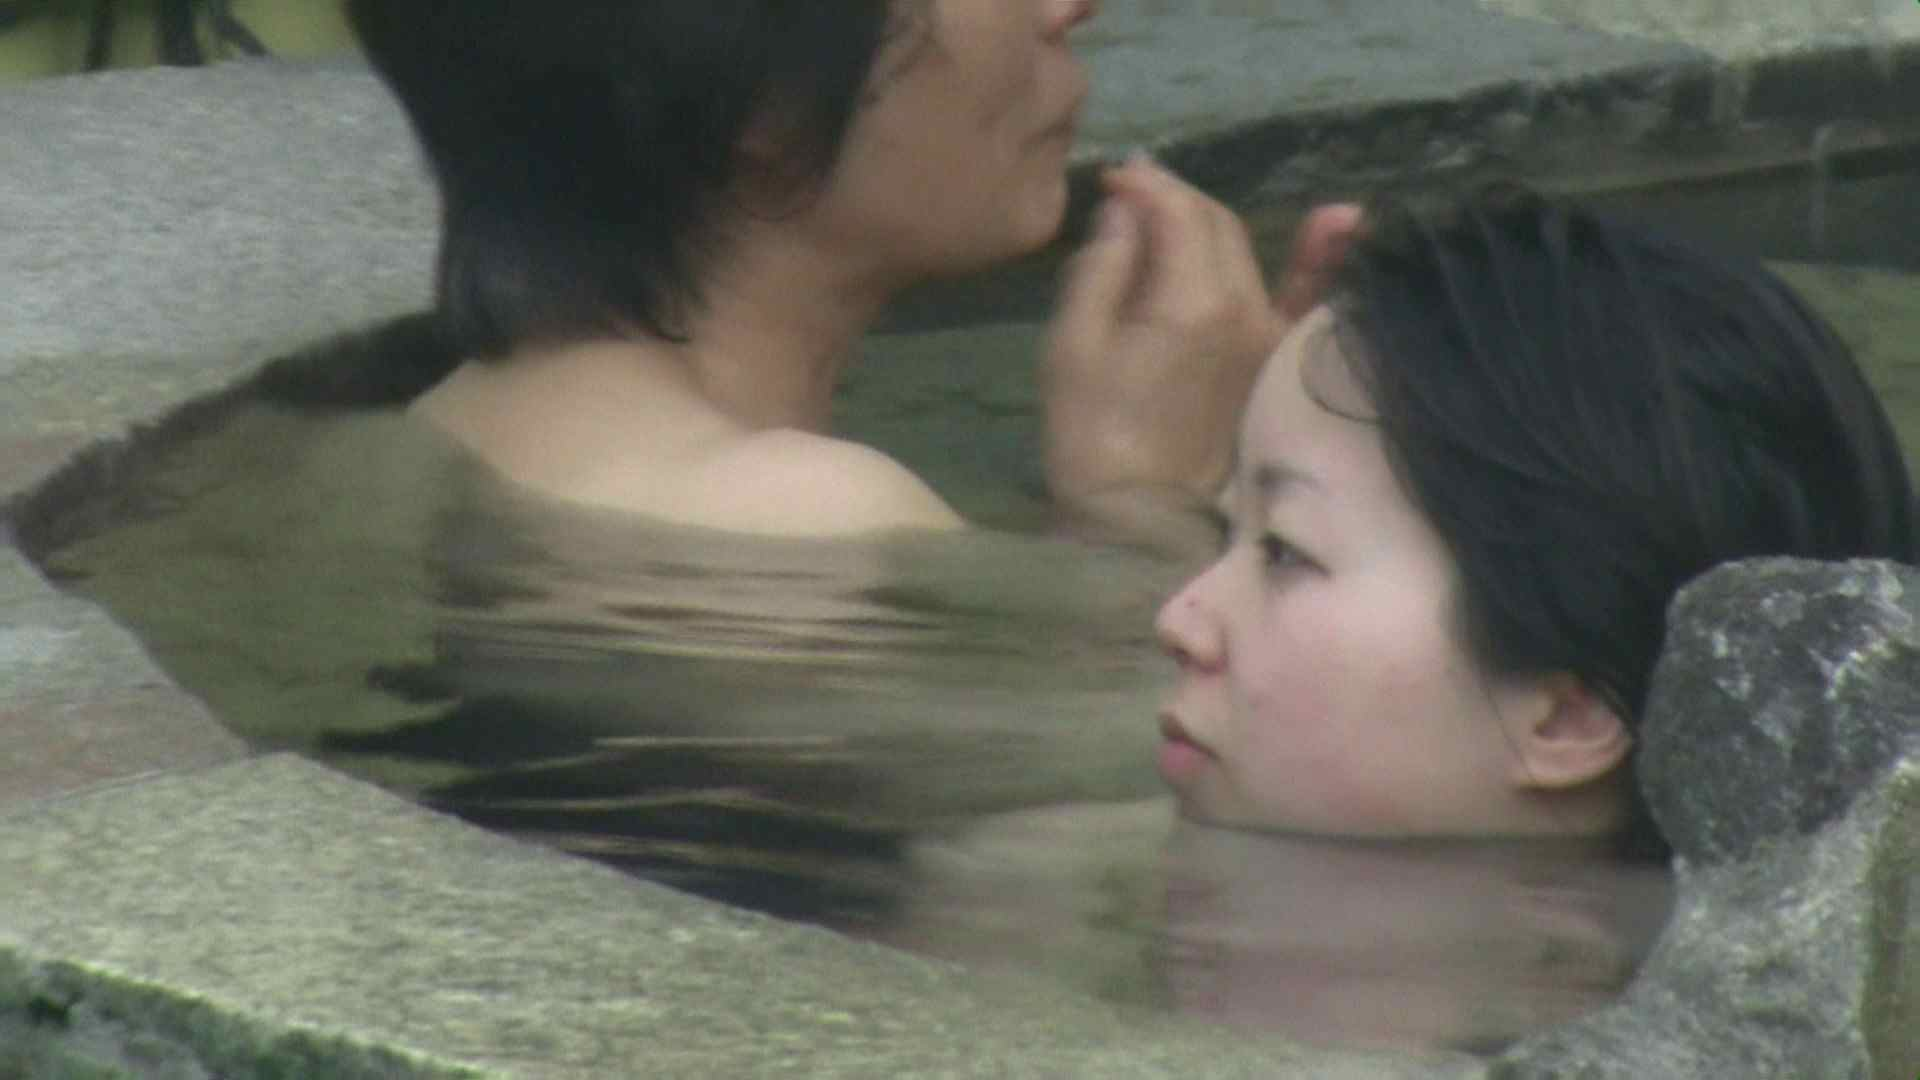 Aquaな露天風呂Vol.06【VIP】 HなOL | 盗撮  86pic 25